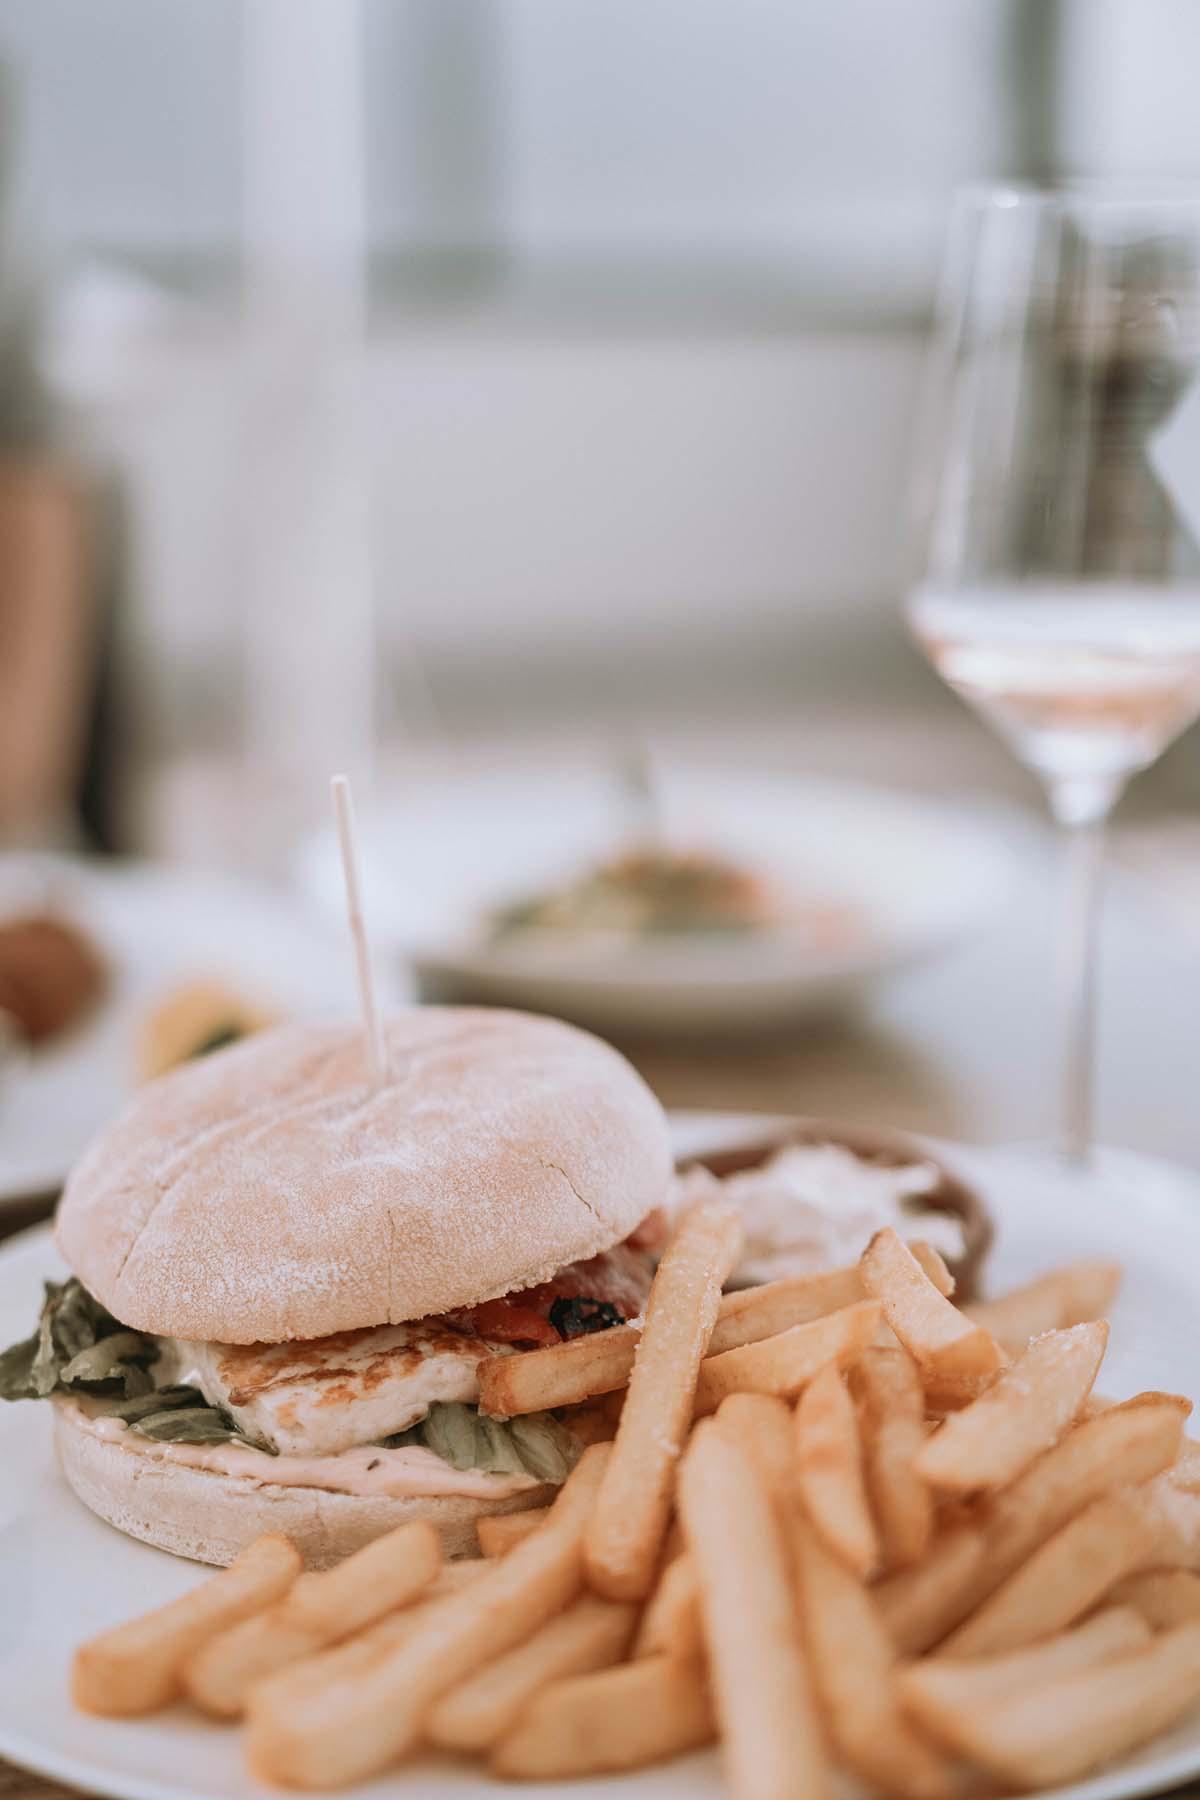 amrum-insel-urlaub-strand-33-burger